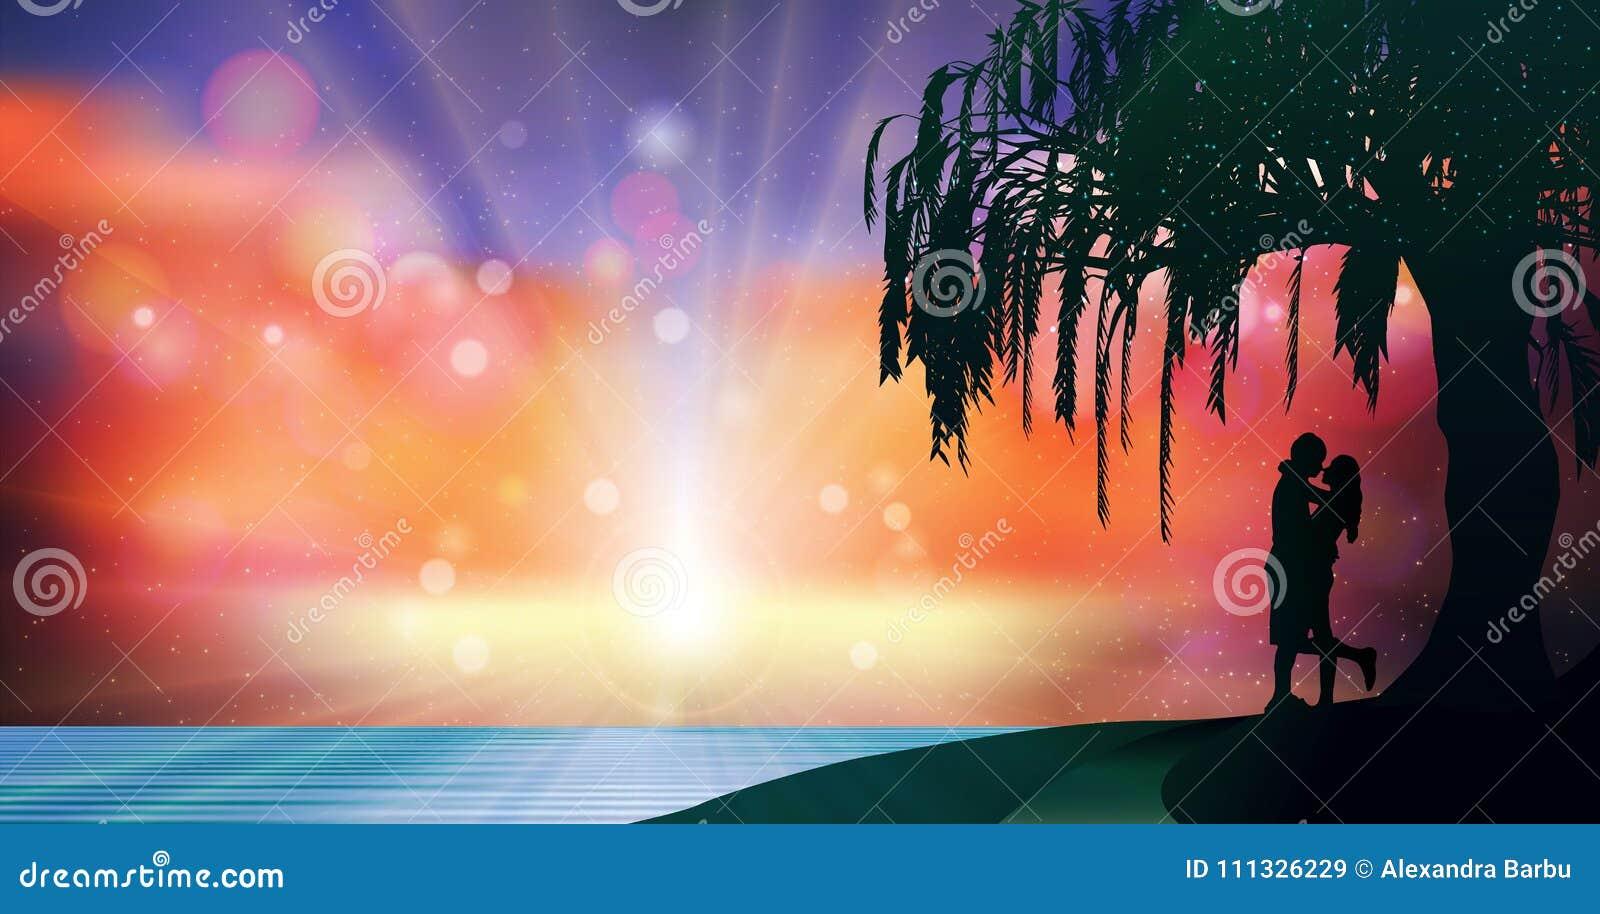 Fantasy Surreal Sky Lovers Silhouette Romantic Magic Wallpaper